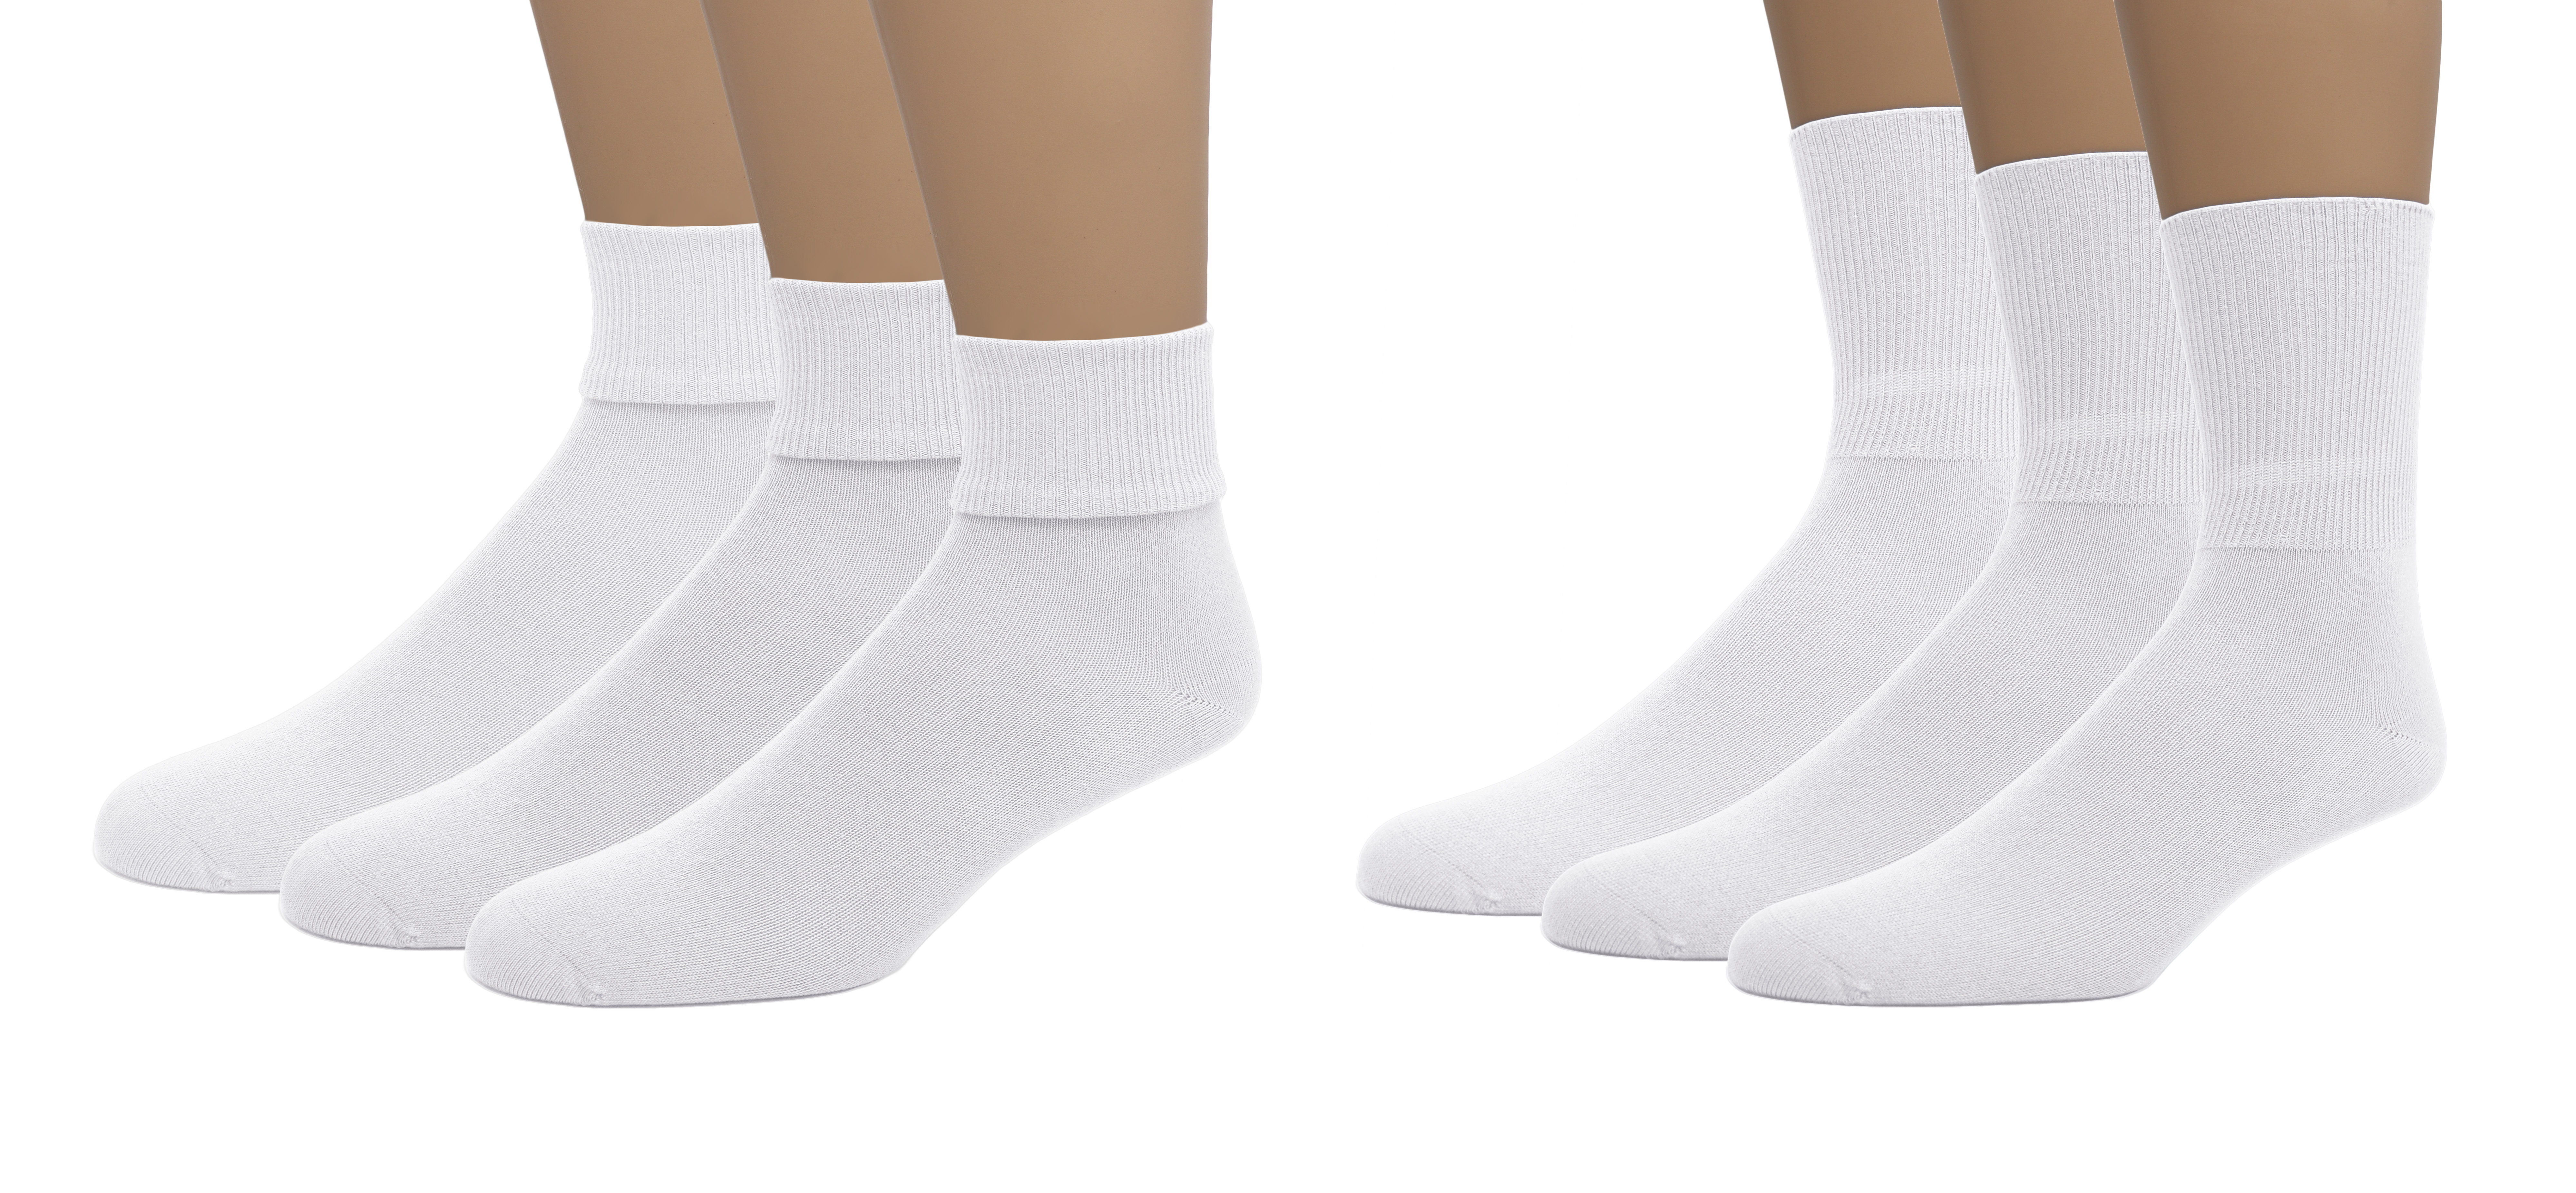 EMEM Apparel Unisex Kids Soft Bamboo Cotton Crew or Triple Roll Socks 3-Pairs